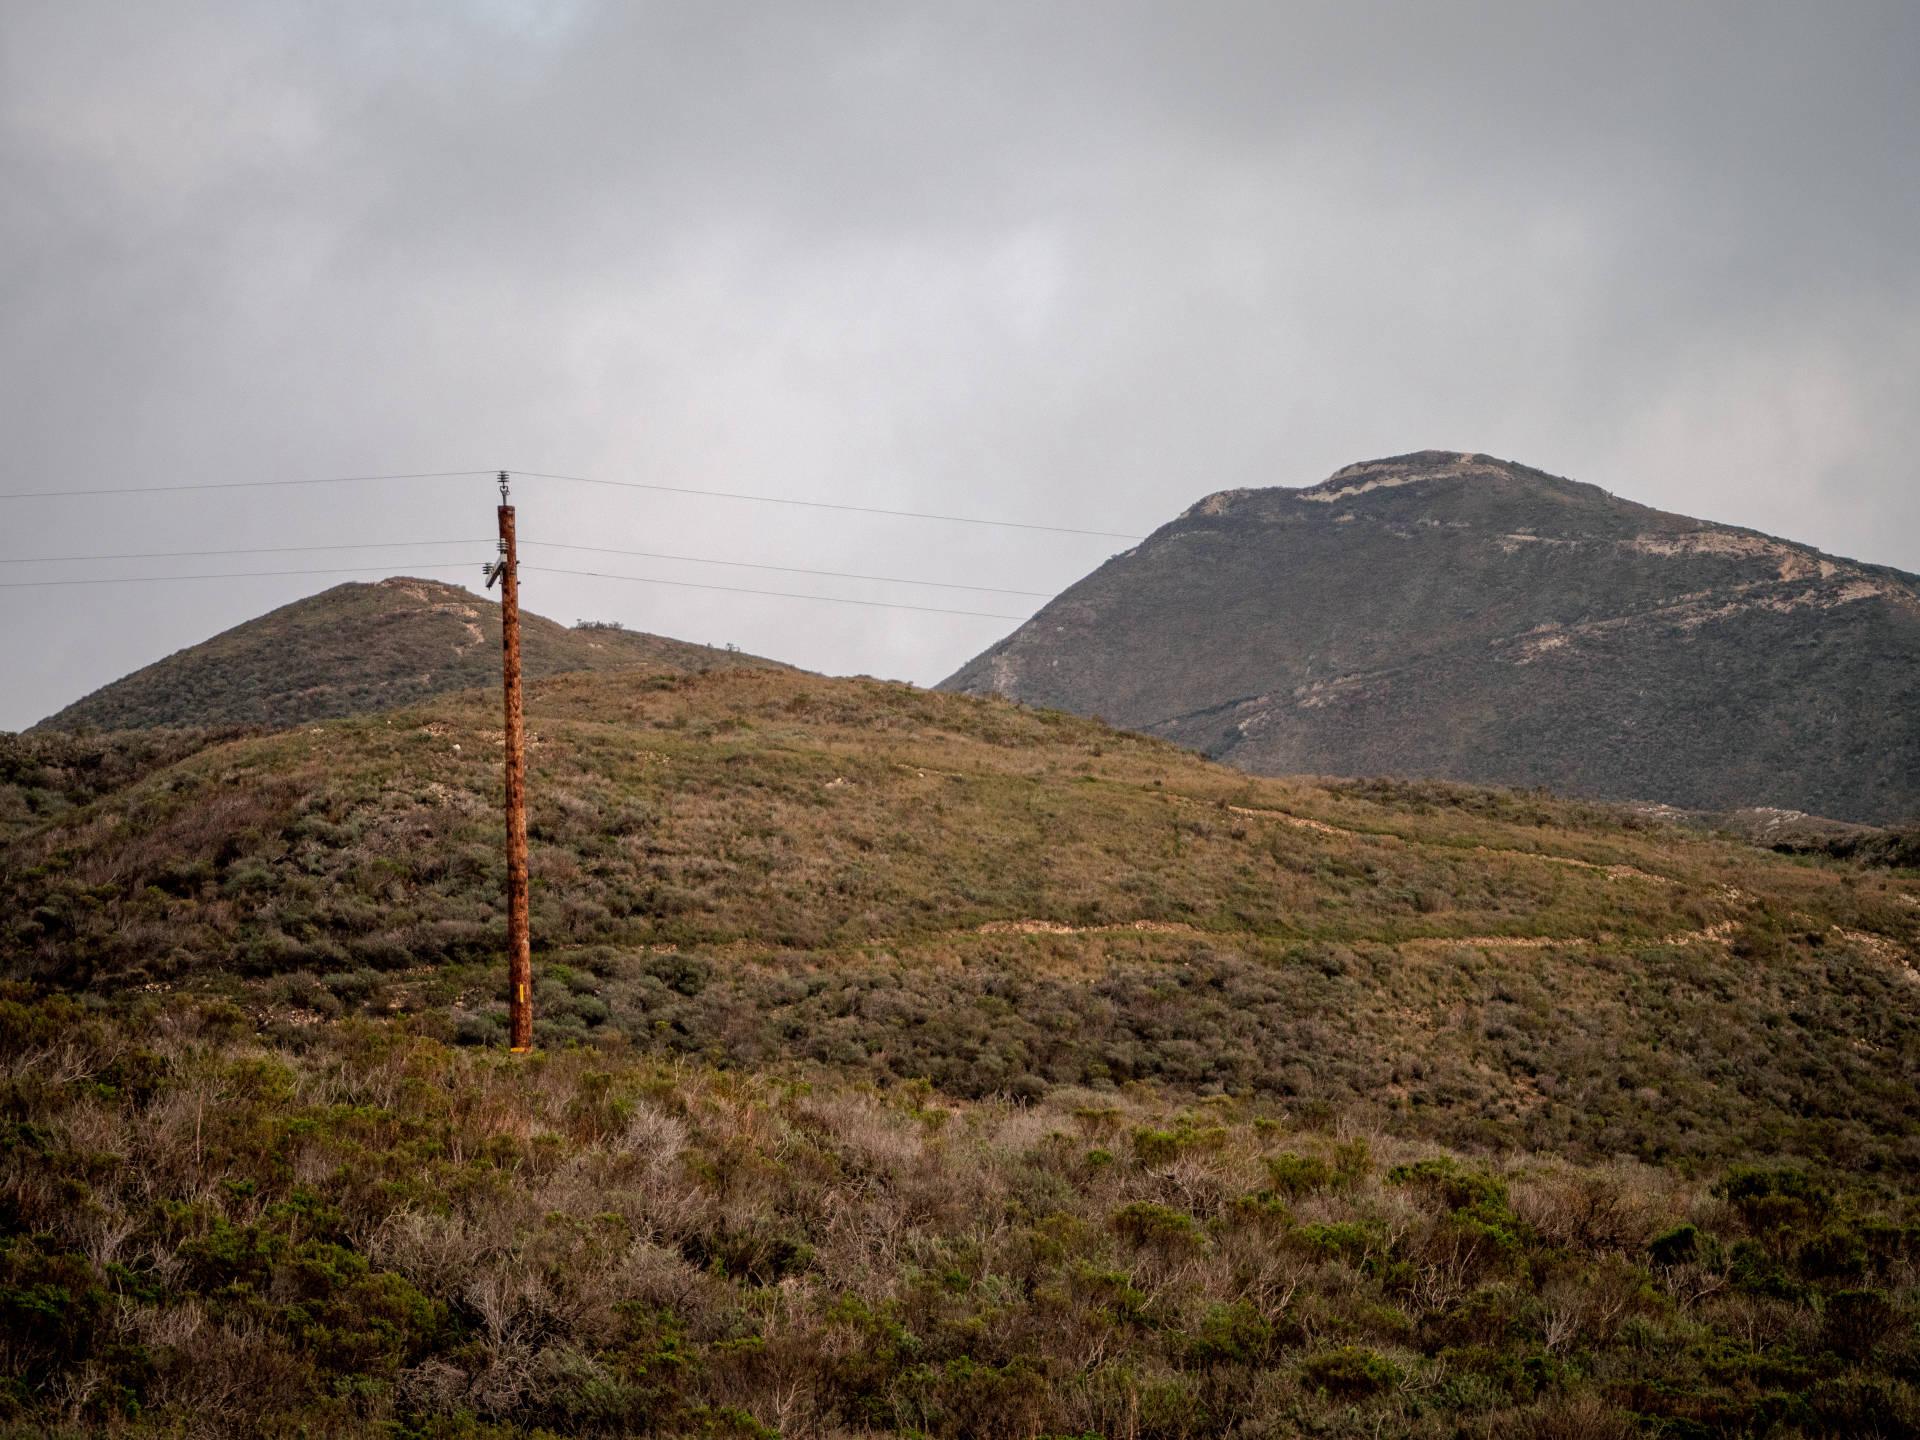 Telephone Pole on a Mountain